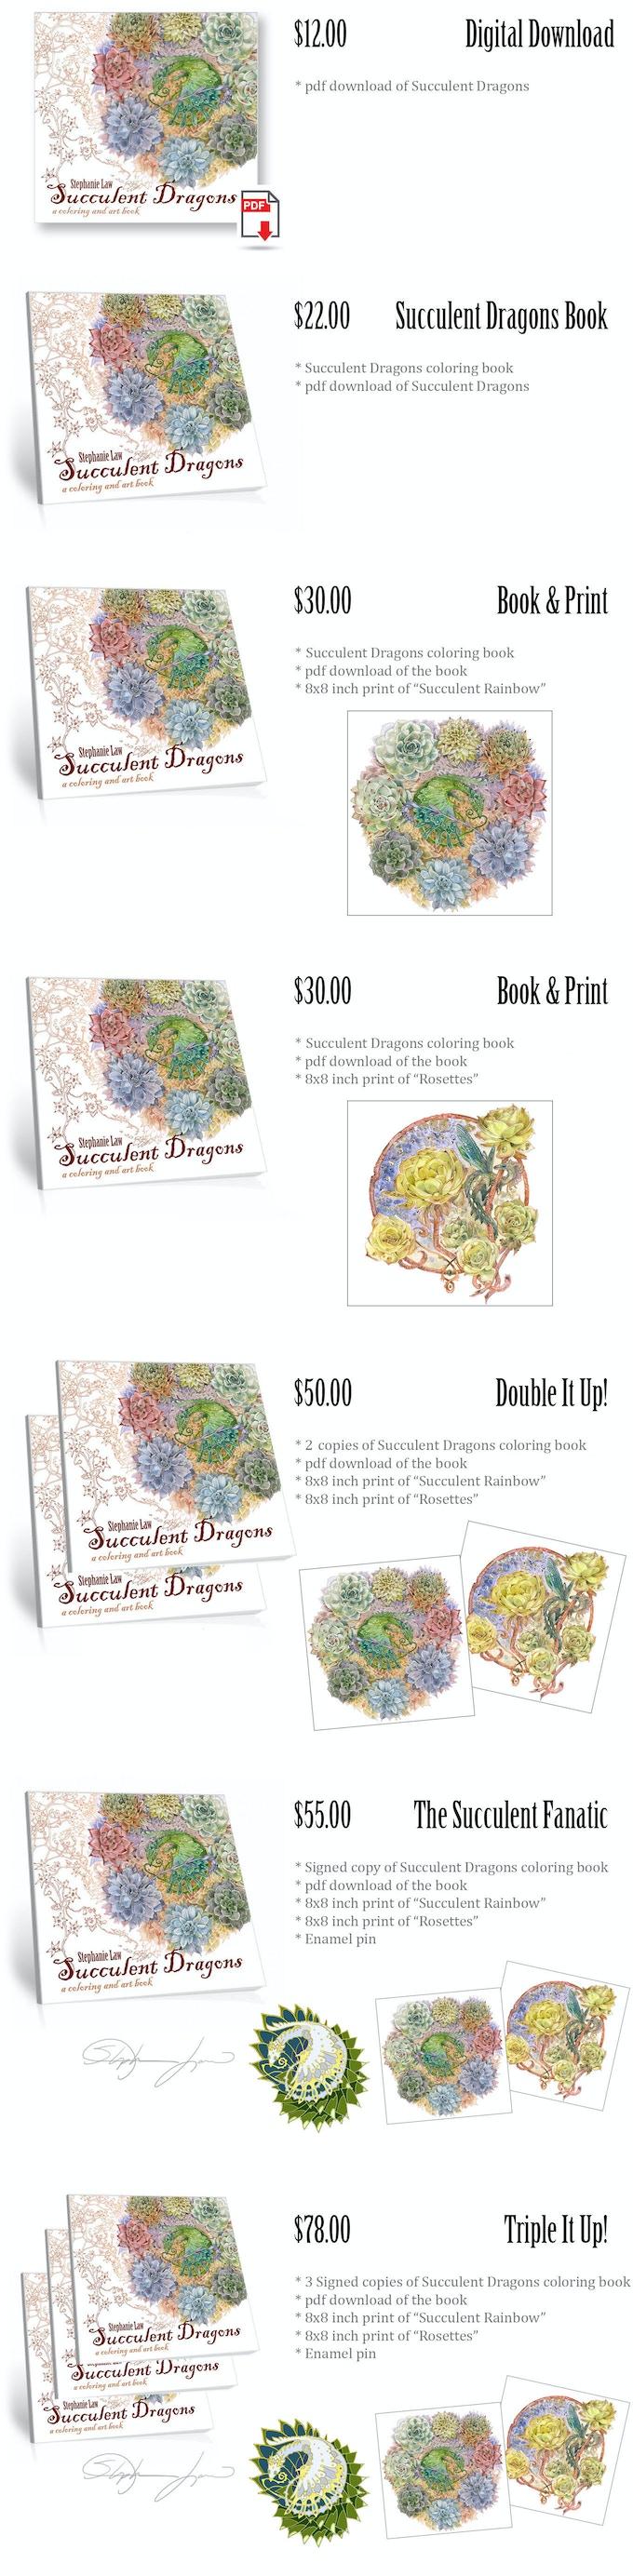 Original Art Adopt A Dragon Sketch Reward Tiers